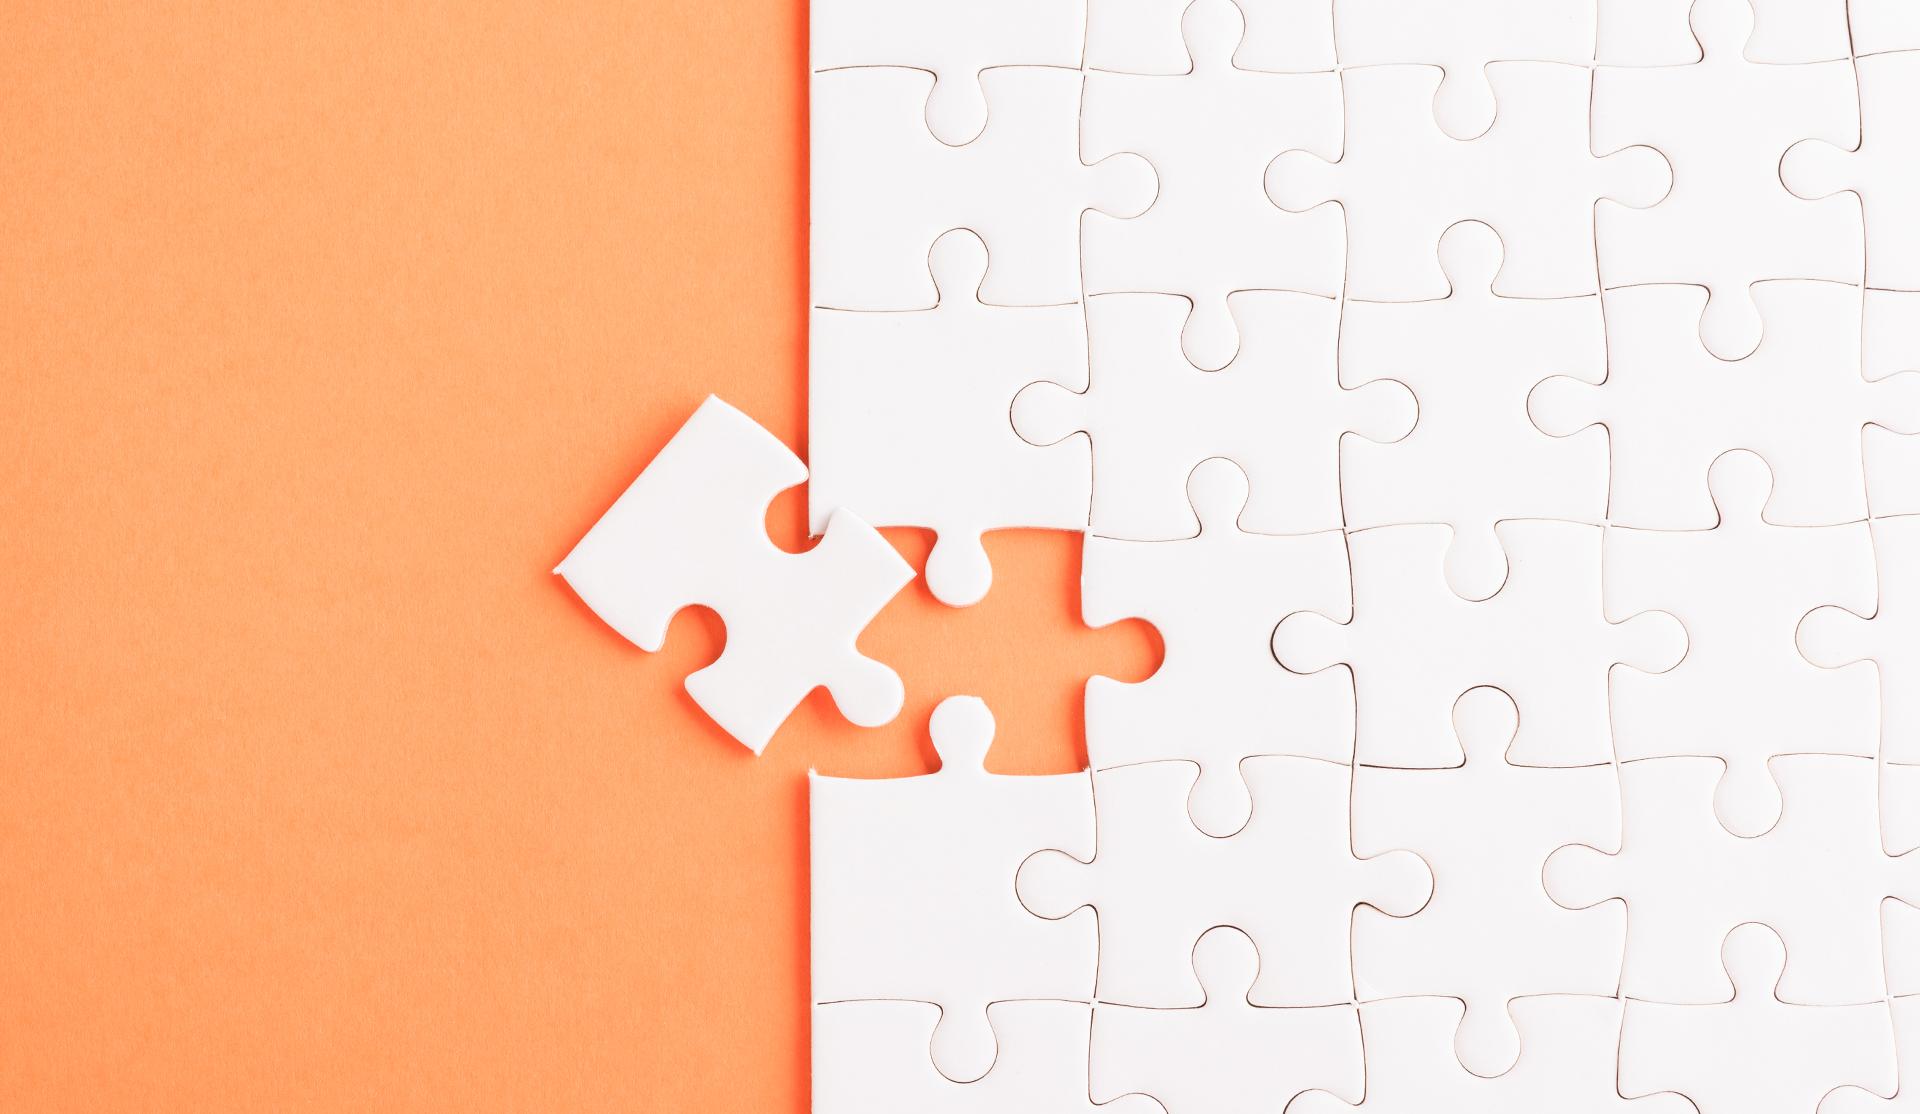 pieza puzzle blanca sobre fondo naranja